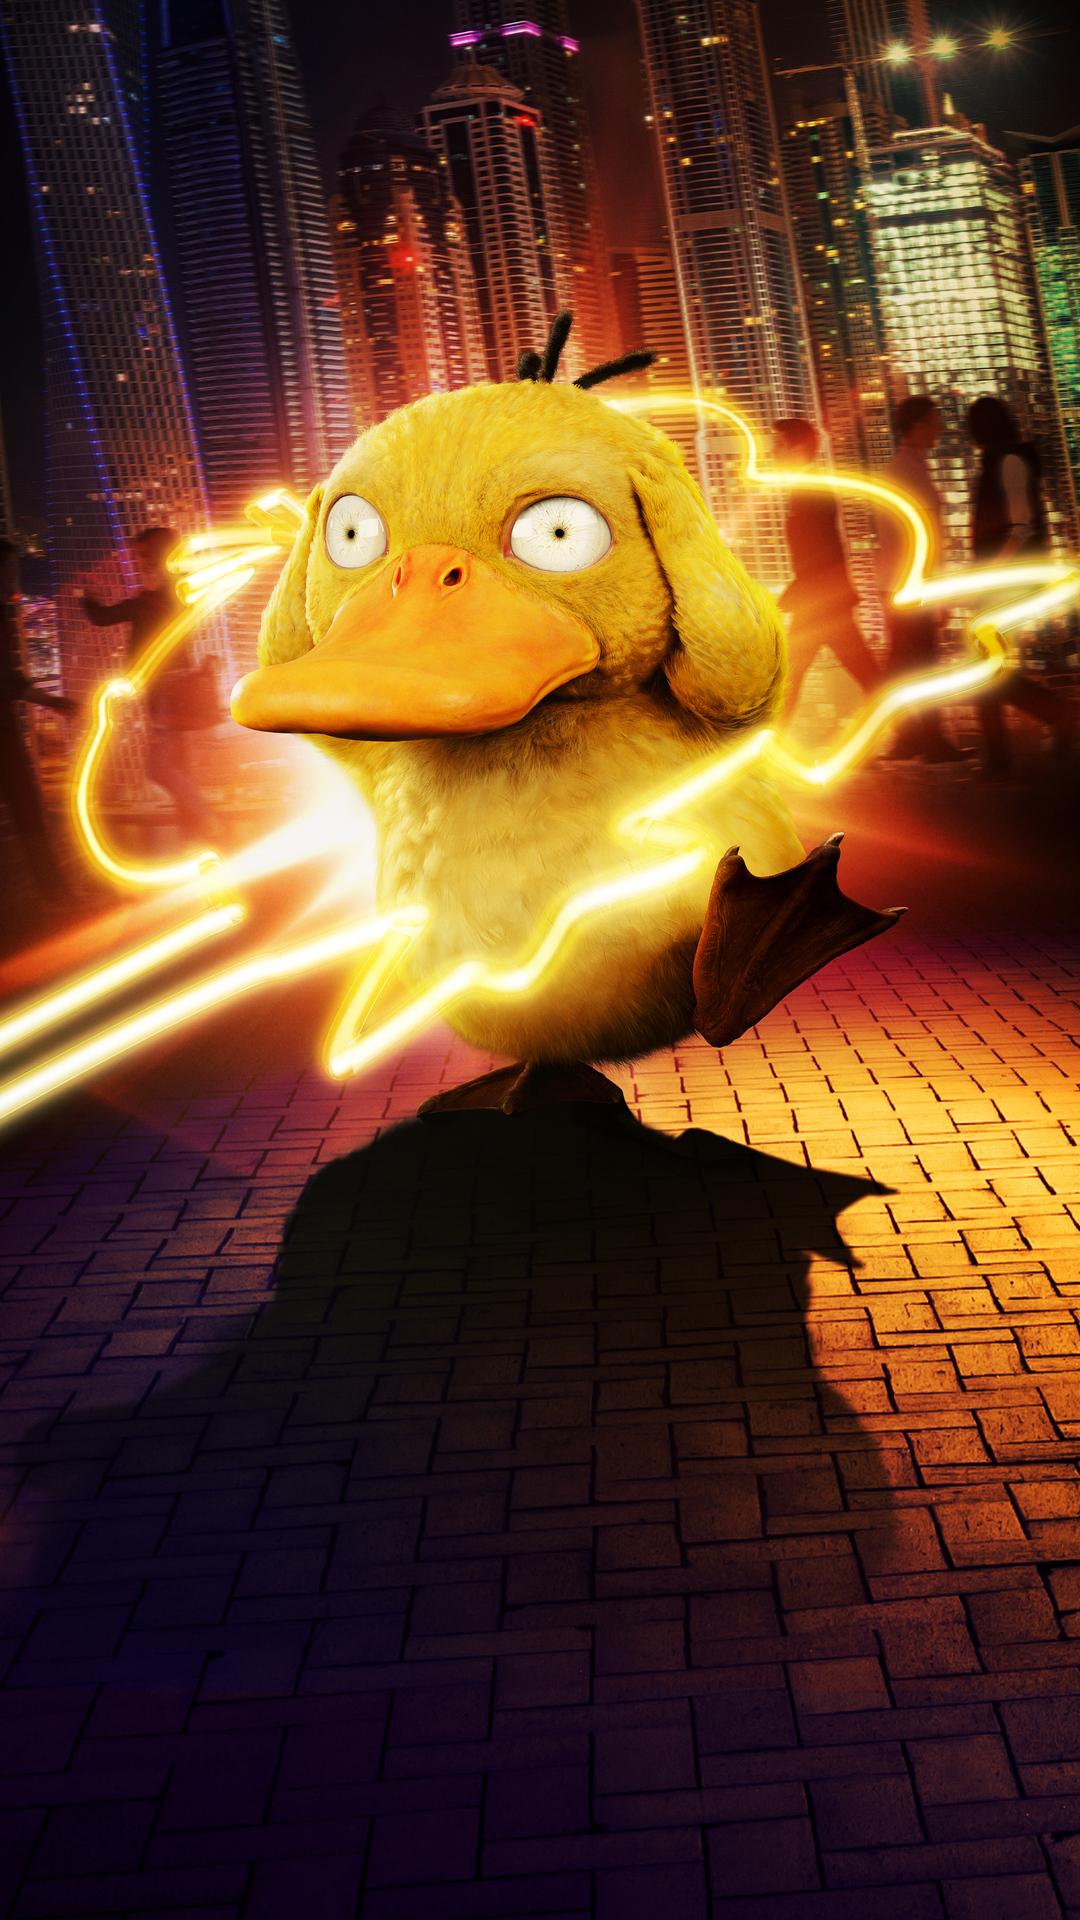 1080x1920 Detective Pikachu Koda Duck Iphone 7,6s,6 Plus ...